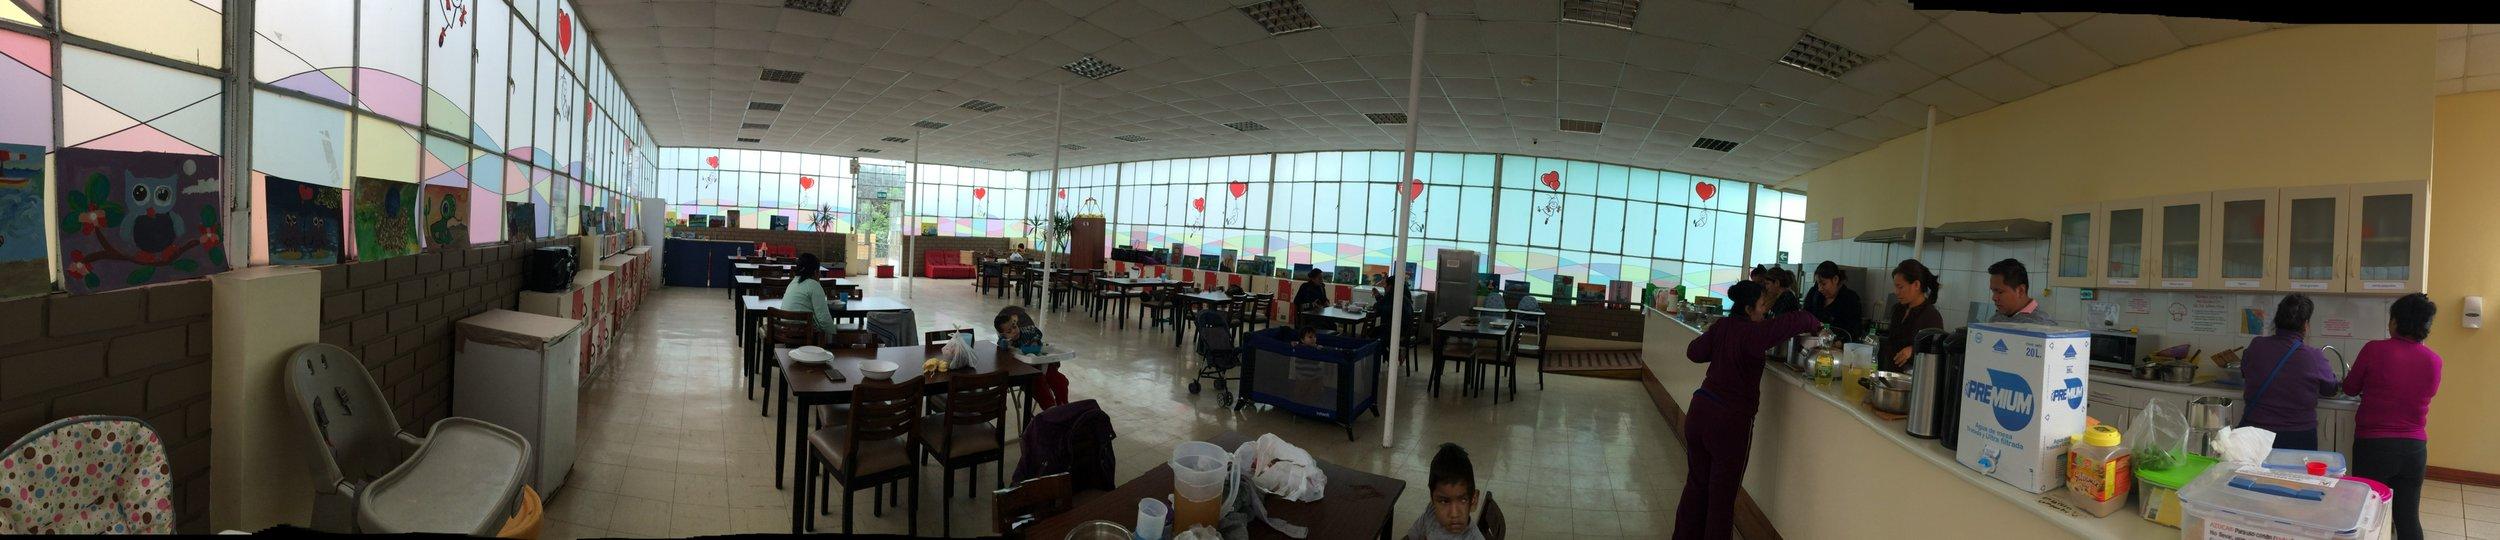 RMH Peru Panorama Shot.jpg